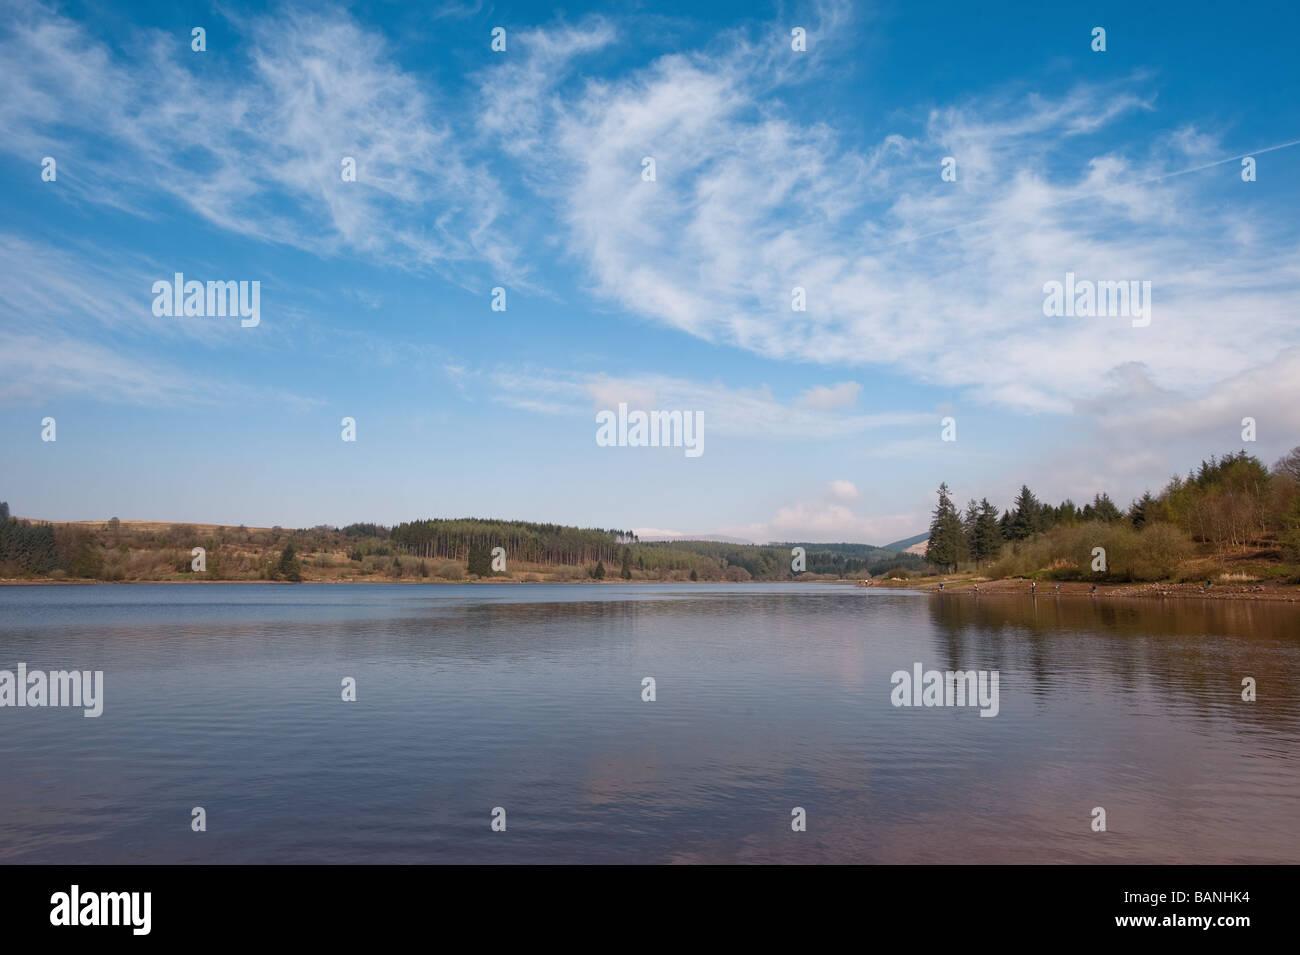 Llyn Onn , Parc national de Brecon Beacons , Pays de Galles Photo Stock